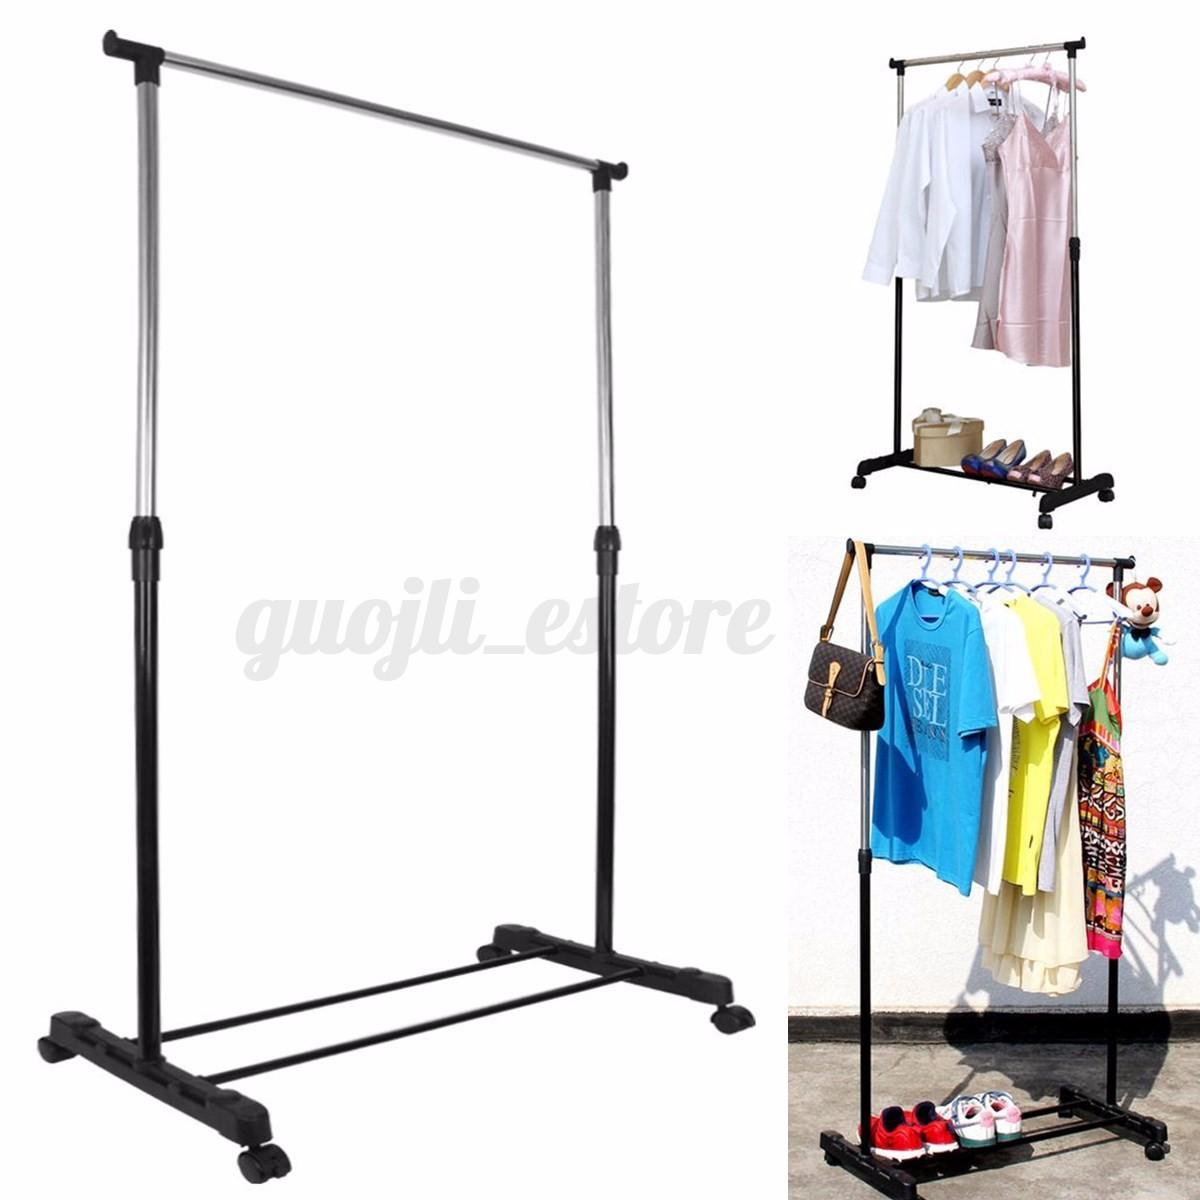 adjustable portable heavy duty garment rack clothes stand hanger mobile on wheel ebay. Black Bedroom Furniture Sets. Home Design Ideas